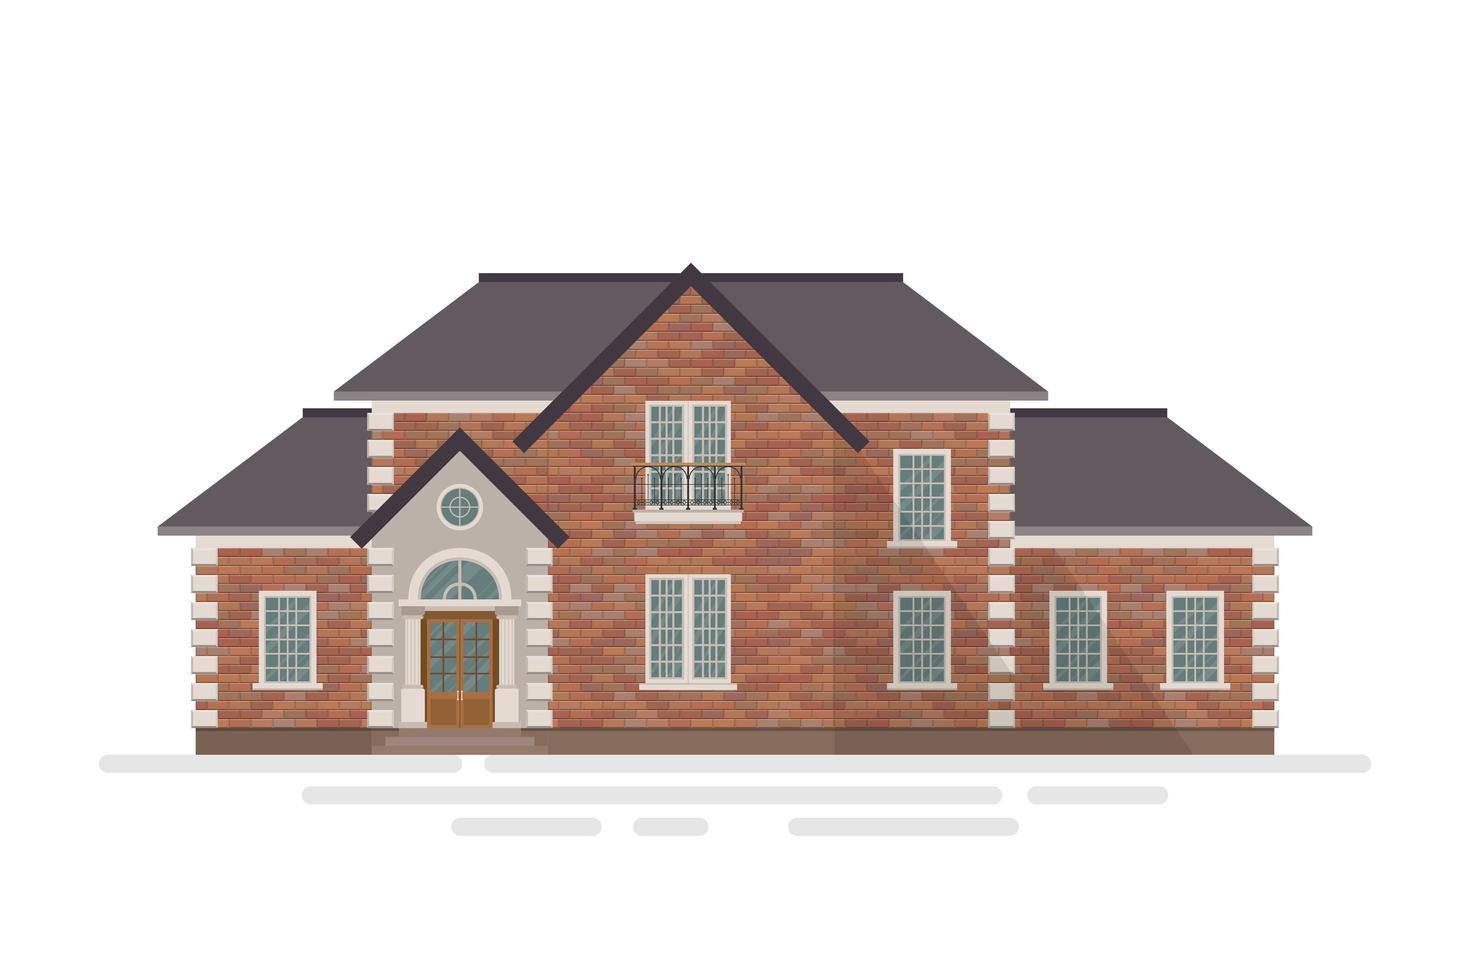 casa de tijolo suburbana isolada vetor